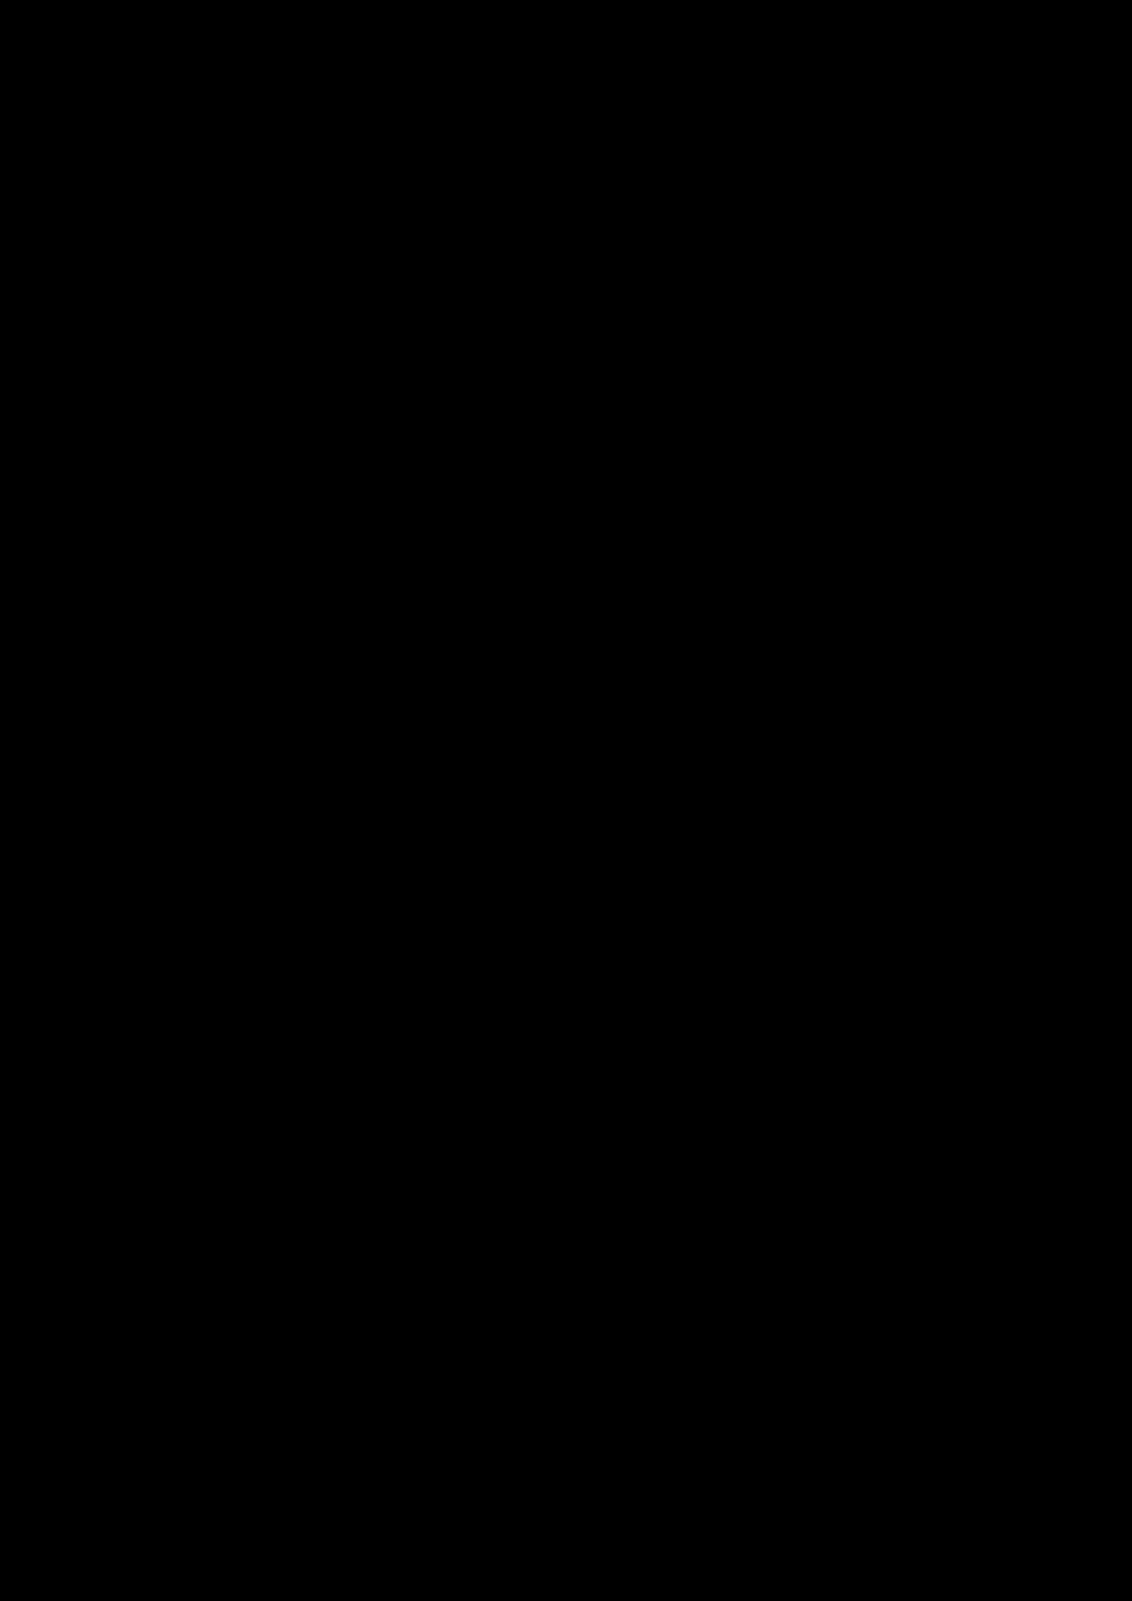 Okean Pustotyi slide, Image 11